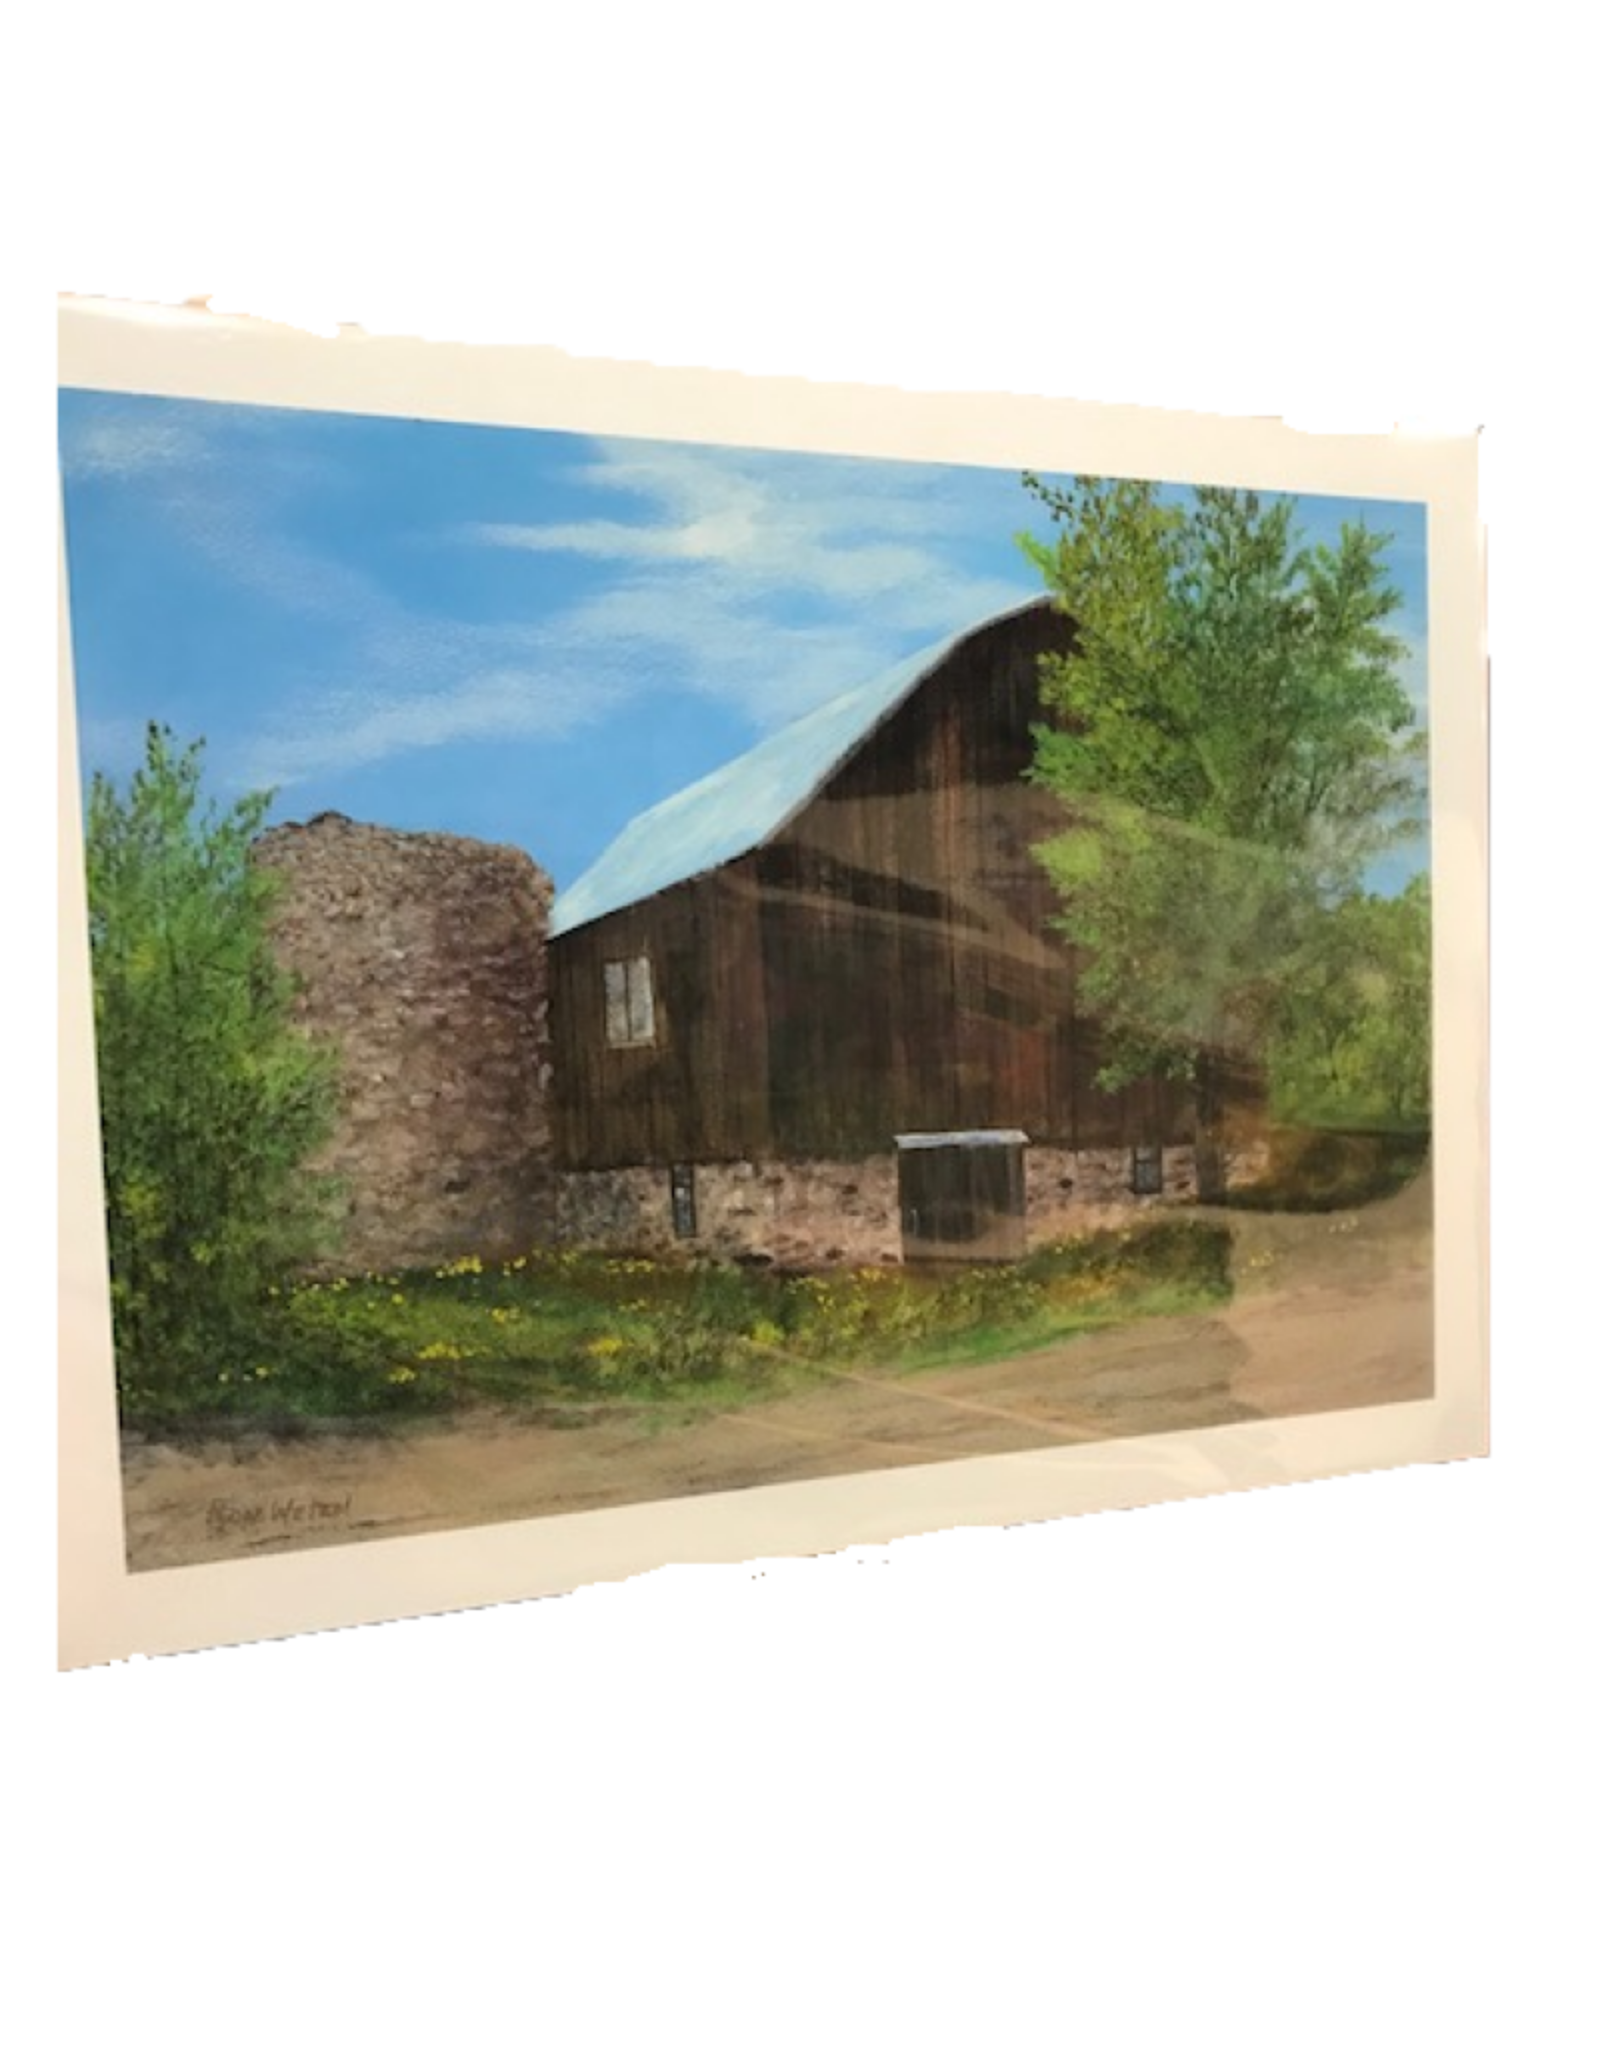 Ron Wetzel Art Ron Wetzel Print - Raftshol Vineyard Barn NW Bayshore Dr Suttons Bay